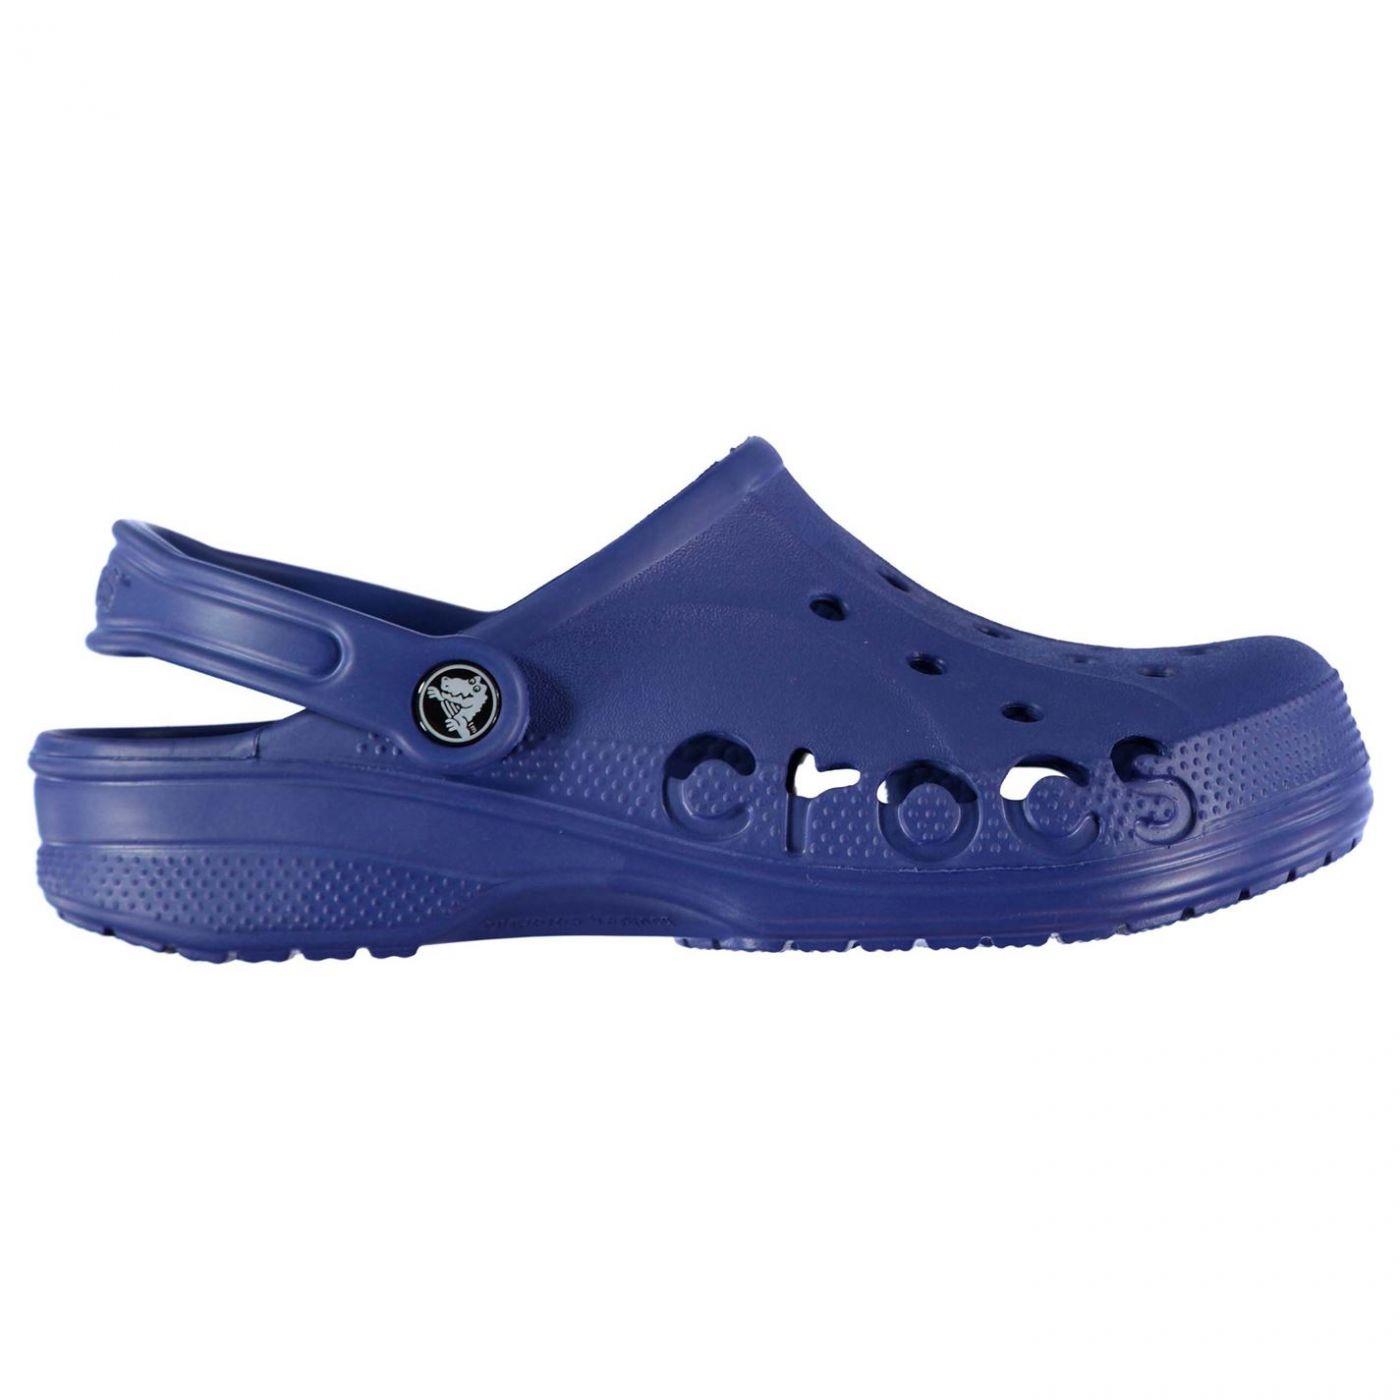 Crocs Baya Clogs Juniors